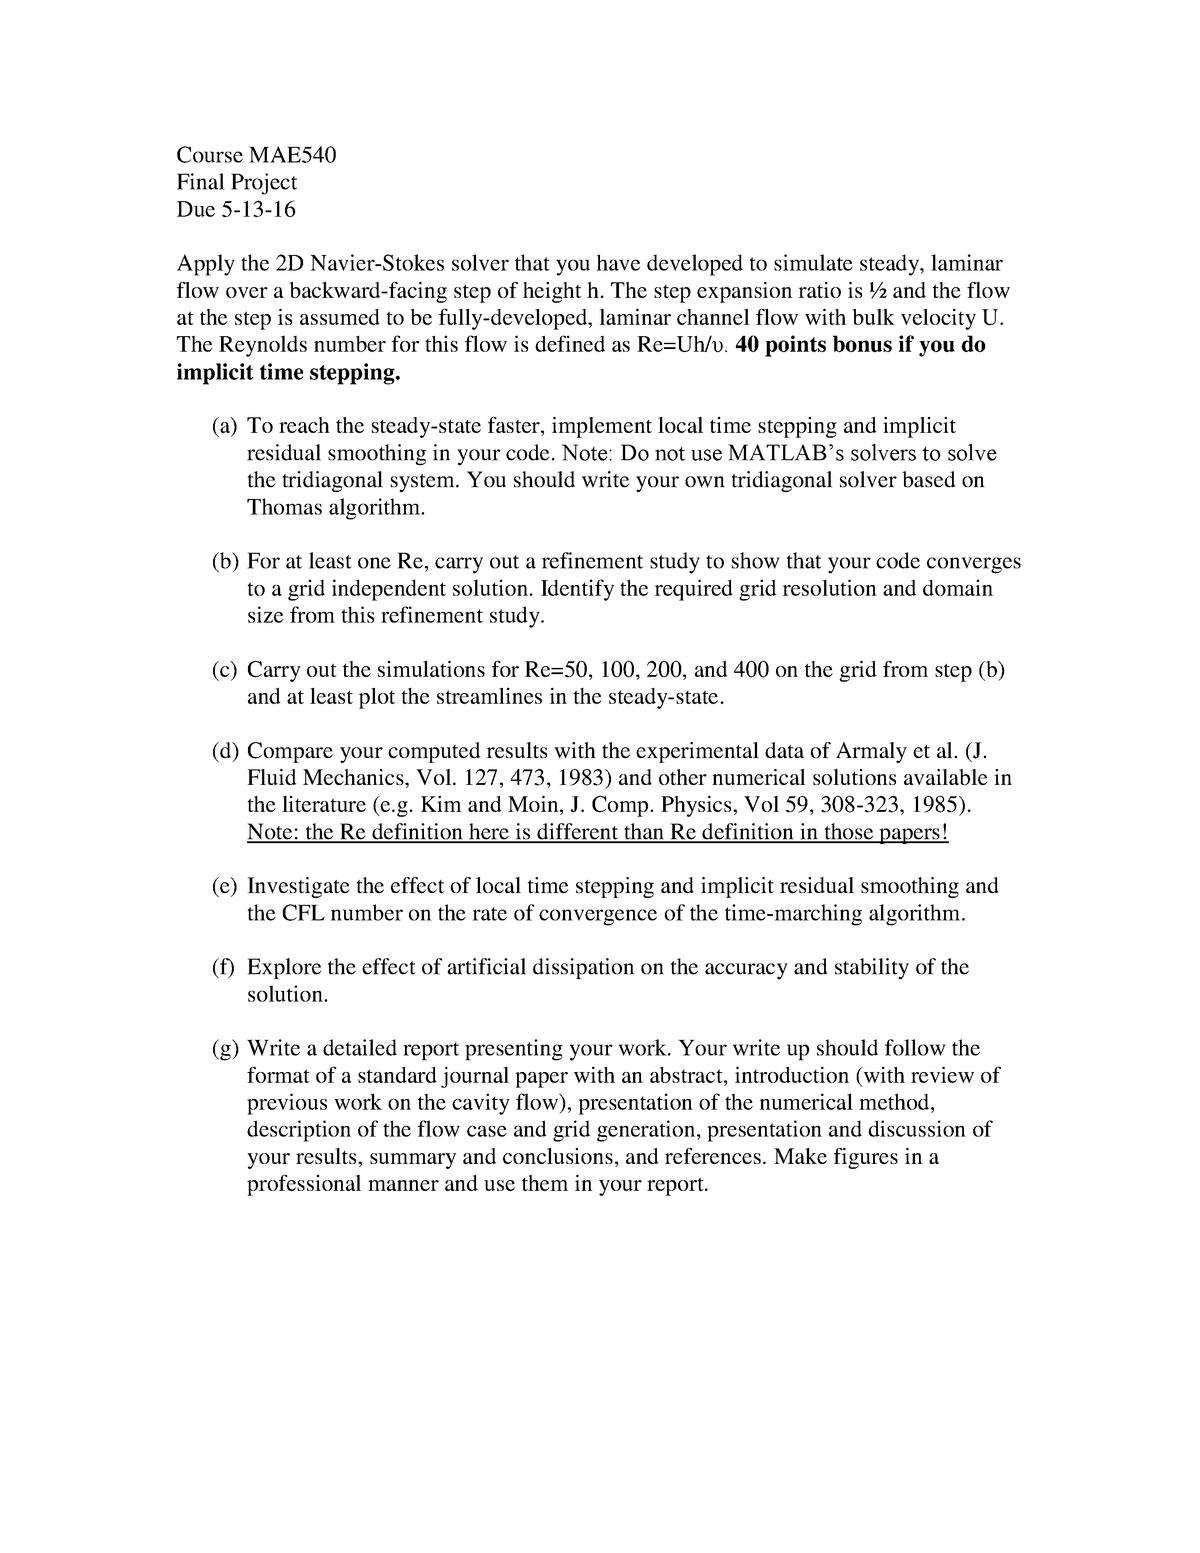 Exam 2016 - MAE 540: Computational Fluid Mech - StuDocu